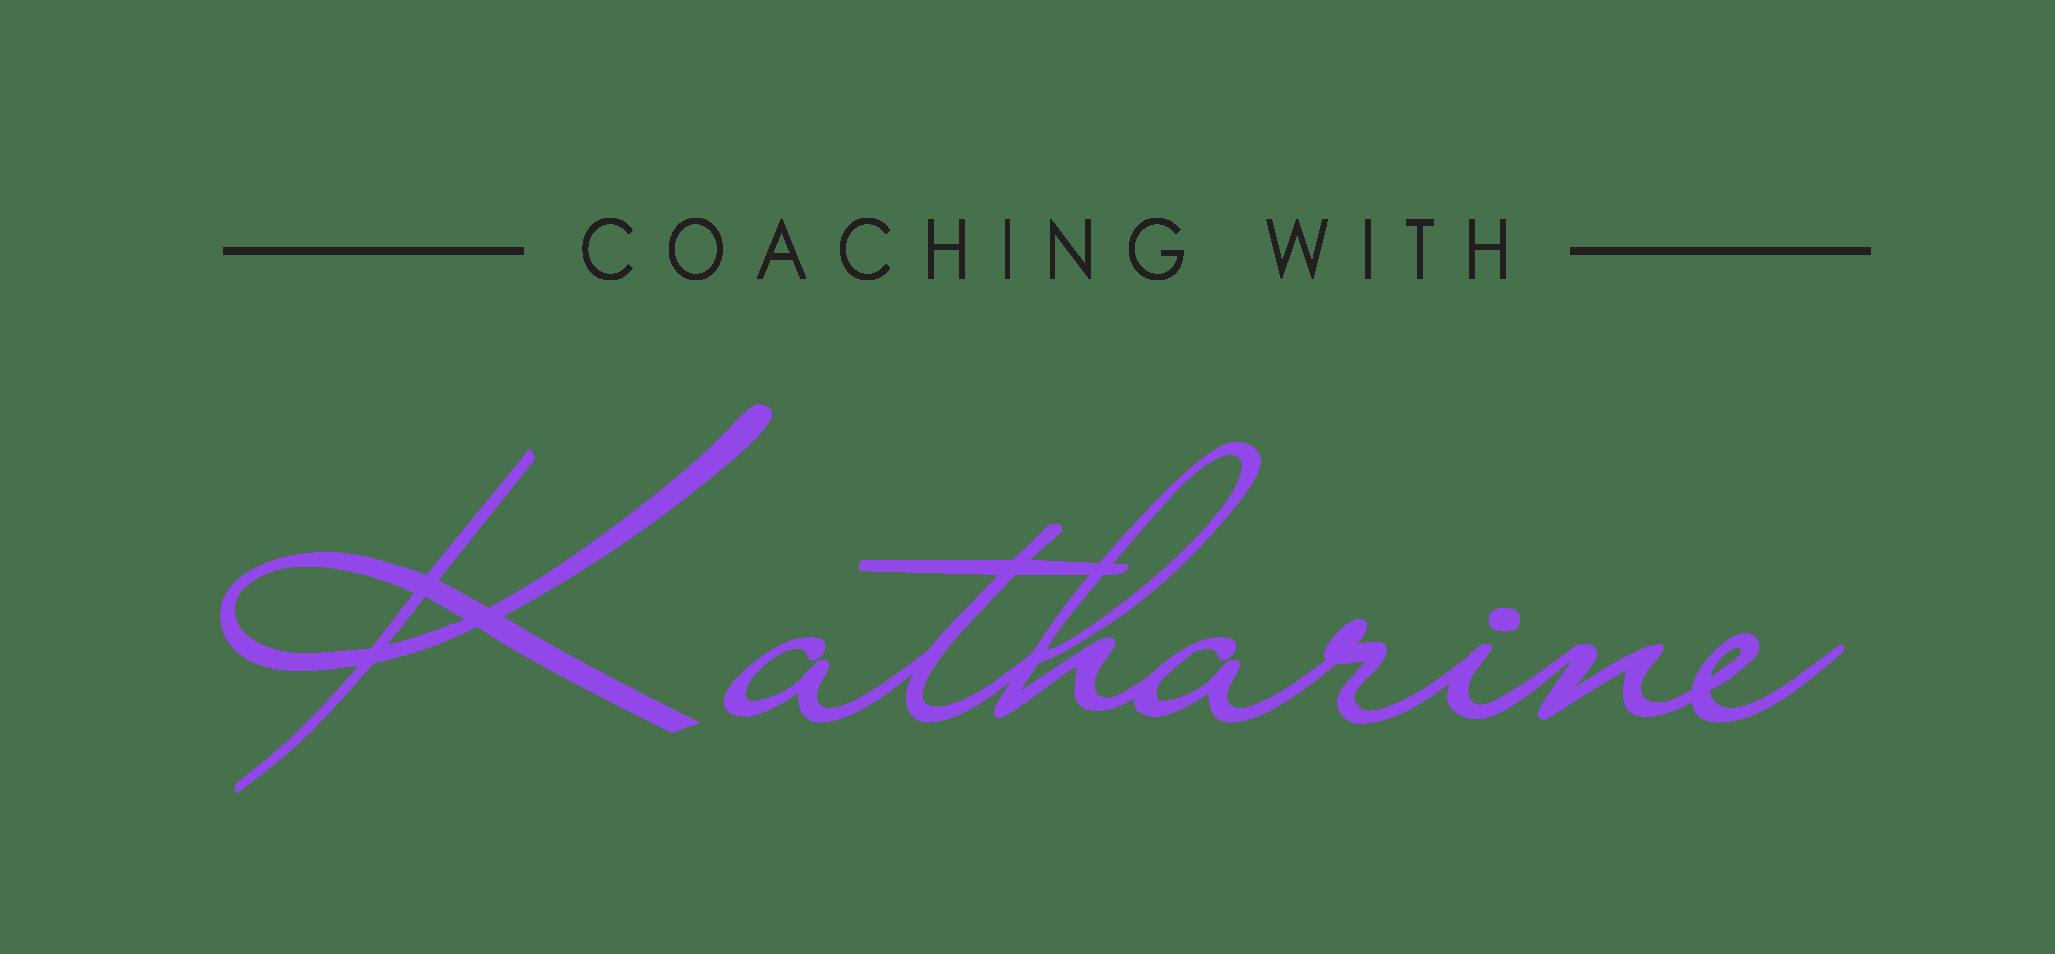 Coaching with Katharine